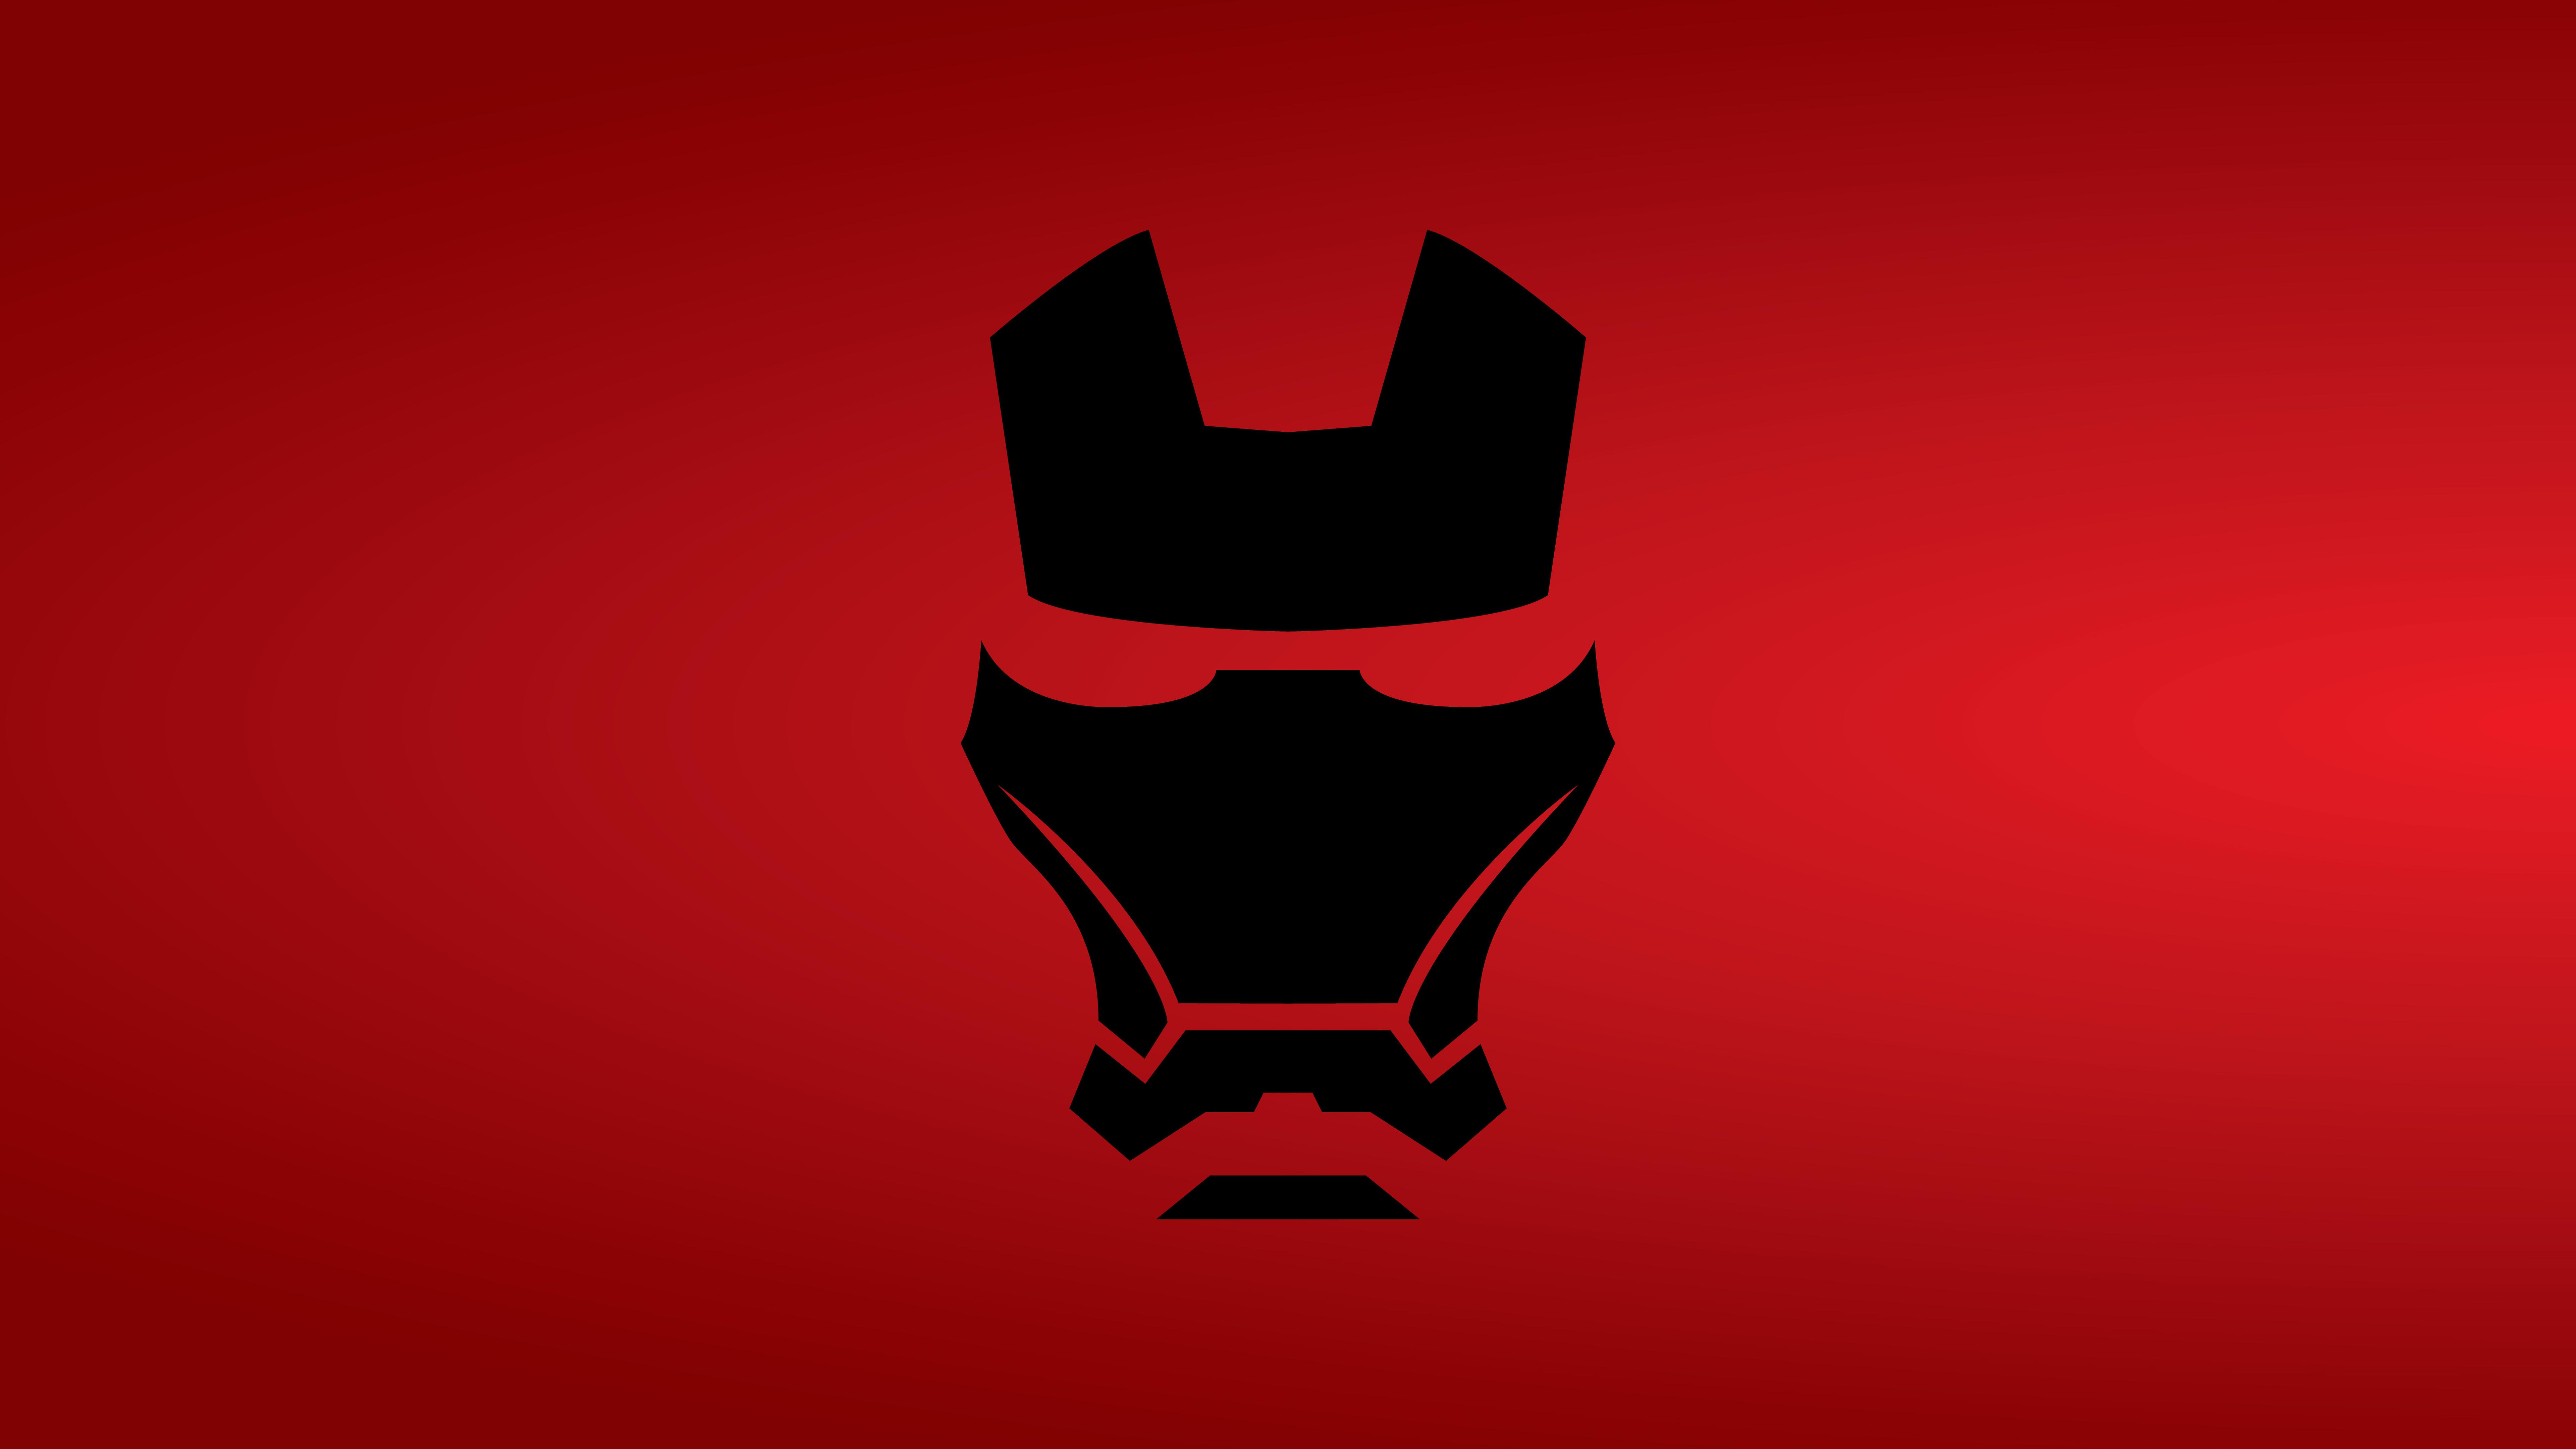 Iron Man Mask Minimalist 8k 8k HD 4k